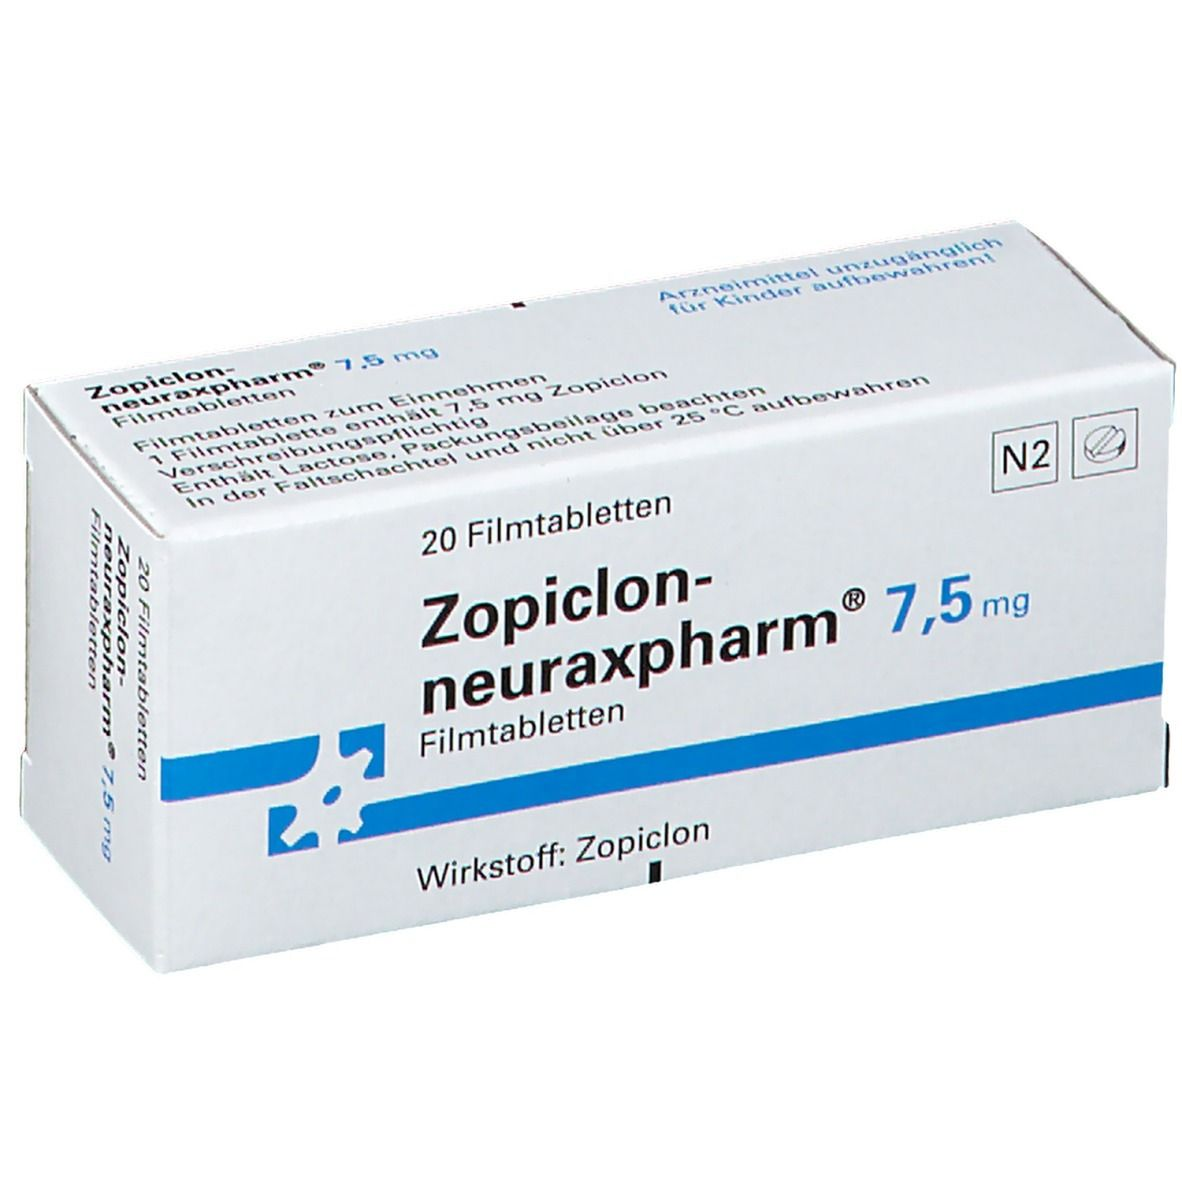 Zopiclon neuraxpharm 7,5 Filmtabl.